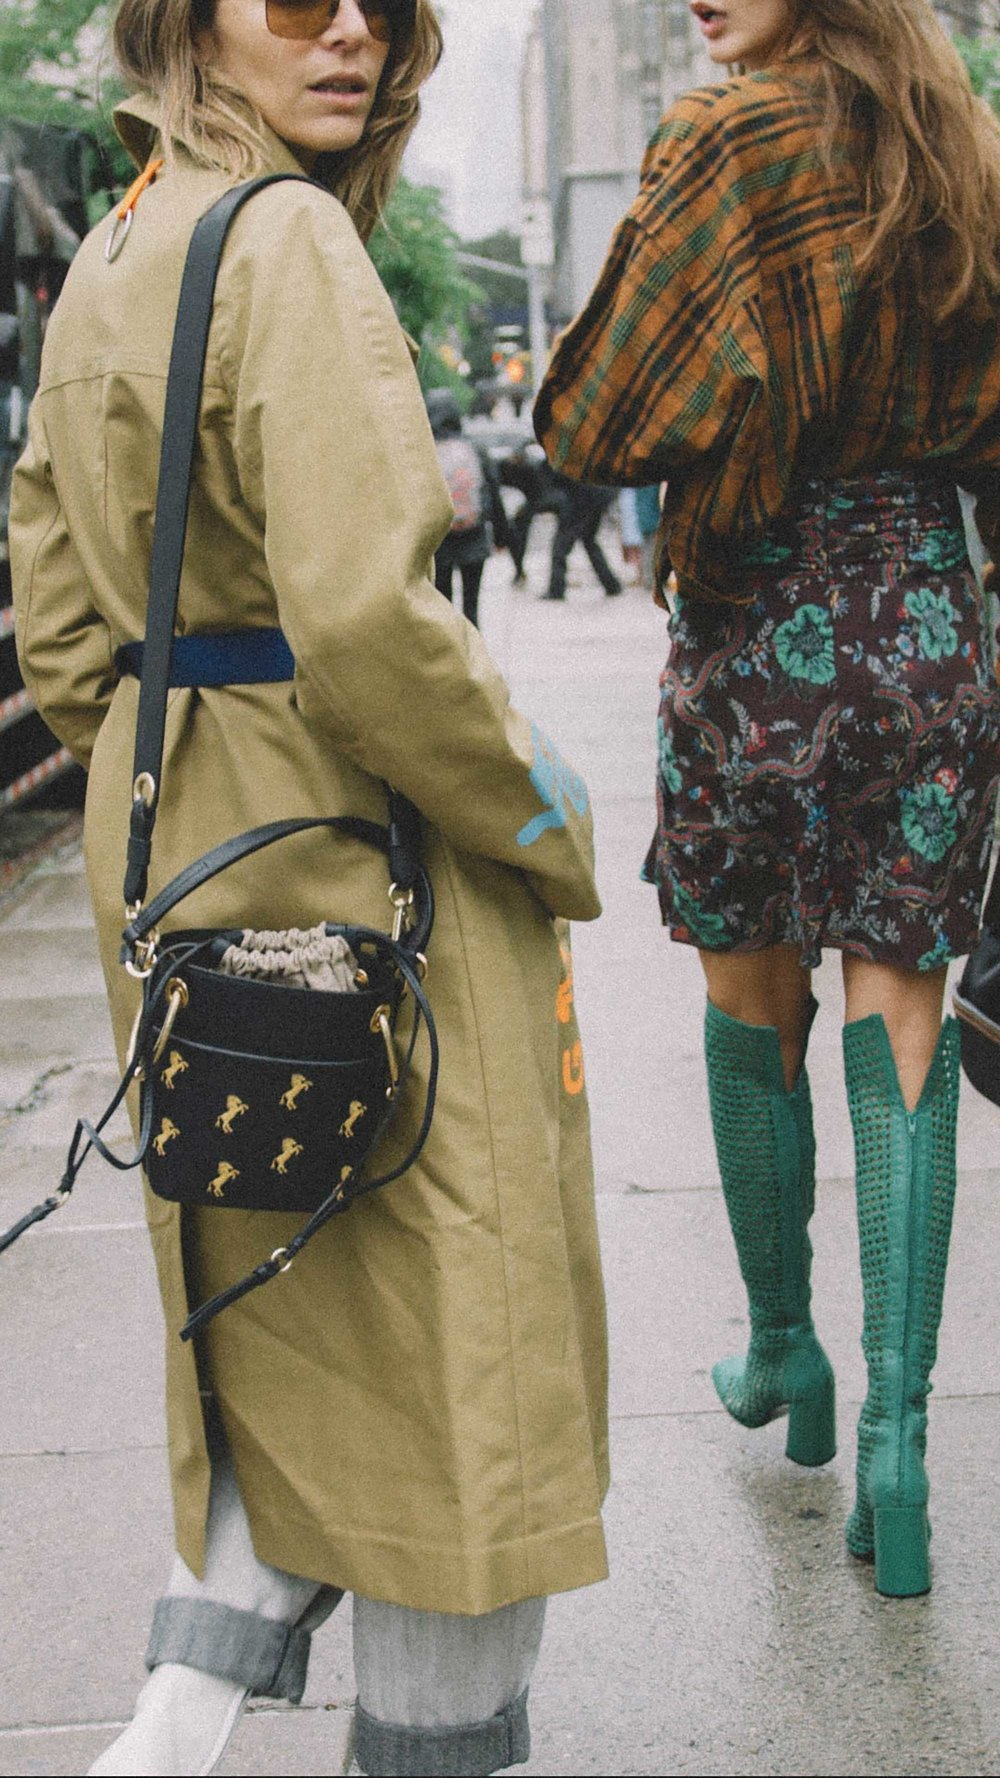 12 Best Chloe bags of Fashion Week -  CHLOe Roy mini leather bucket bag and Chloe Small Tess Leather Shoulder Bag6.jpg